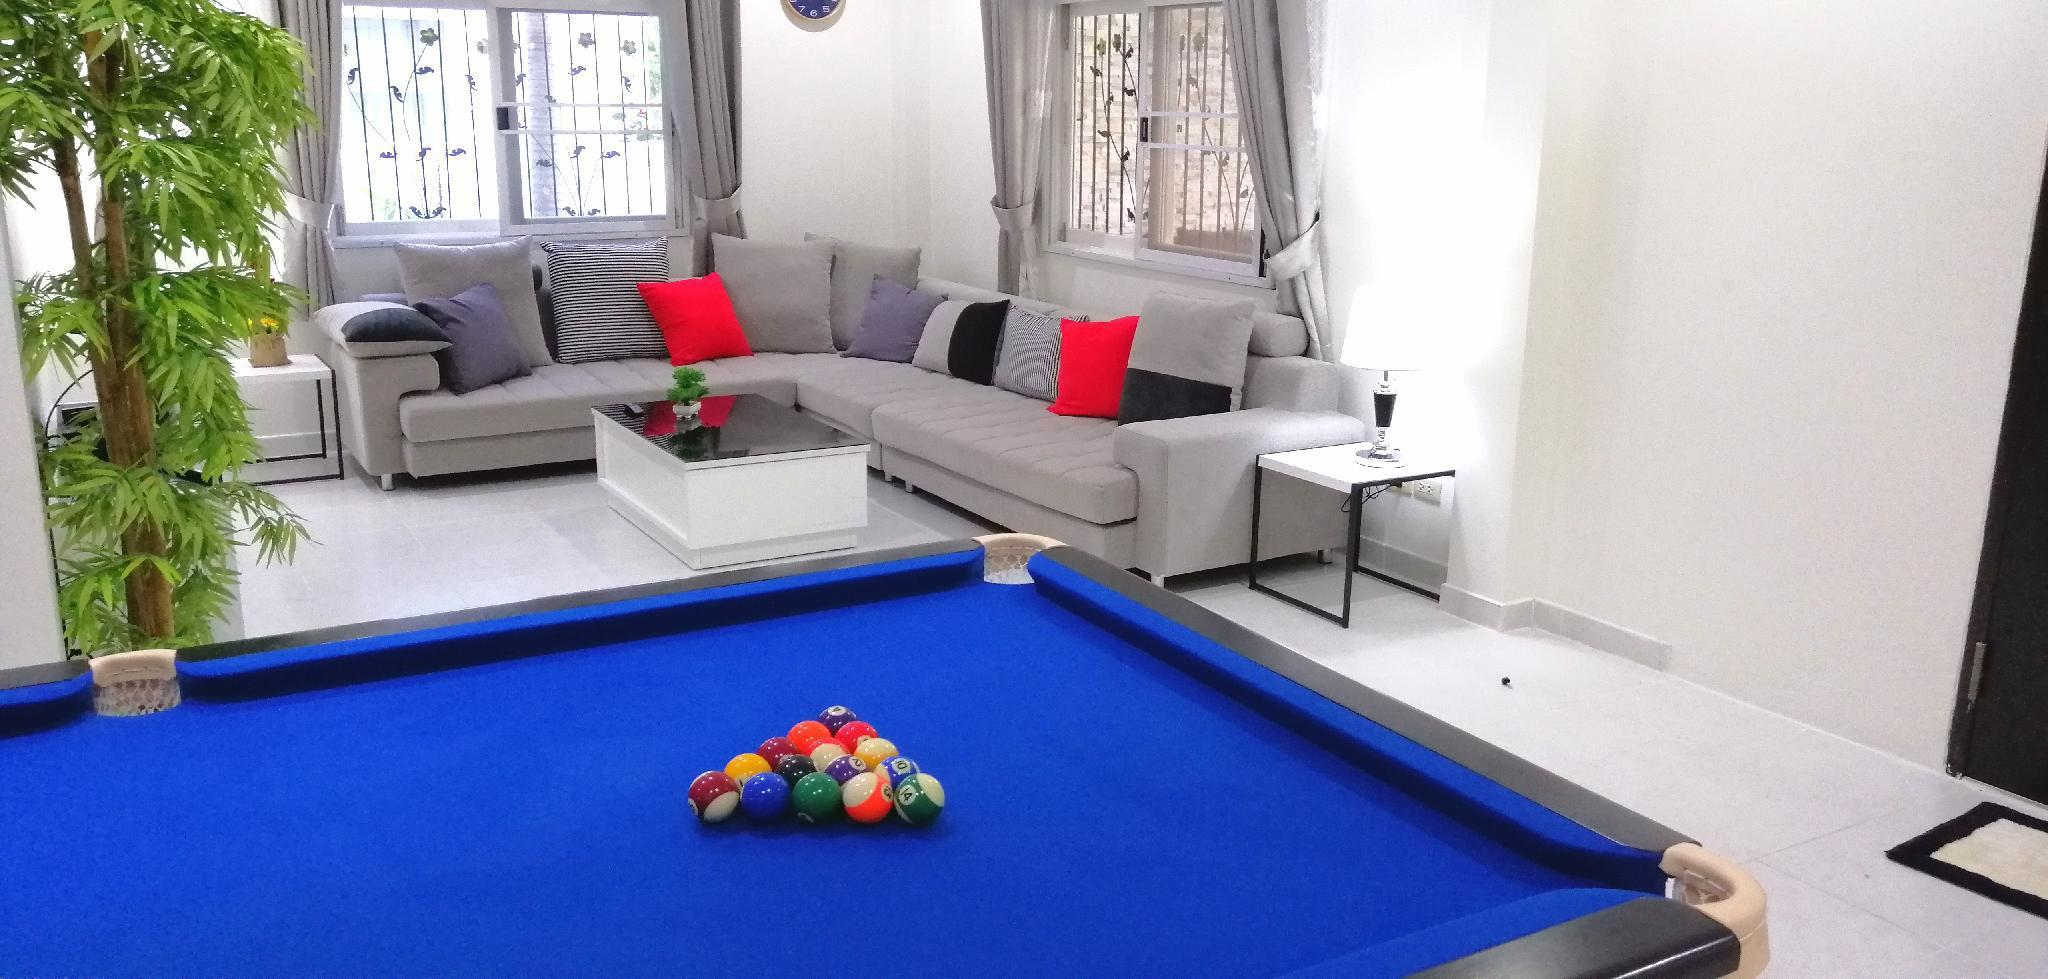 Villa 4 beds,4 baths,pool table,swim pool,games. วิลลา 4 ห้องนอน 4 ห้องน้ำส่วนตัว ขนาด 250 ตร.ม. – หาดดงตาล